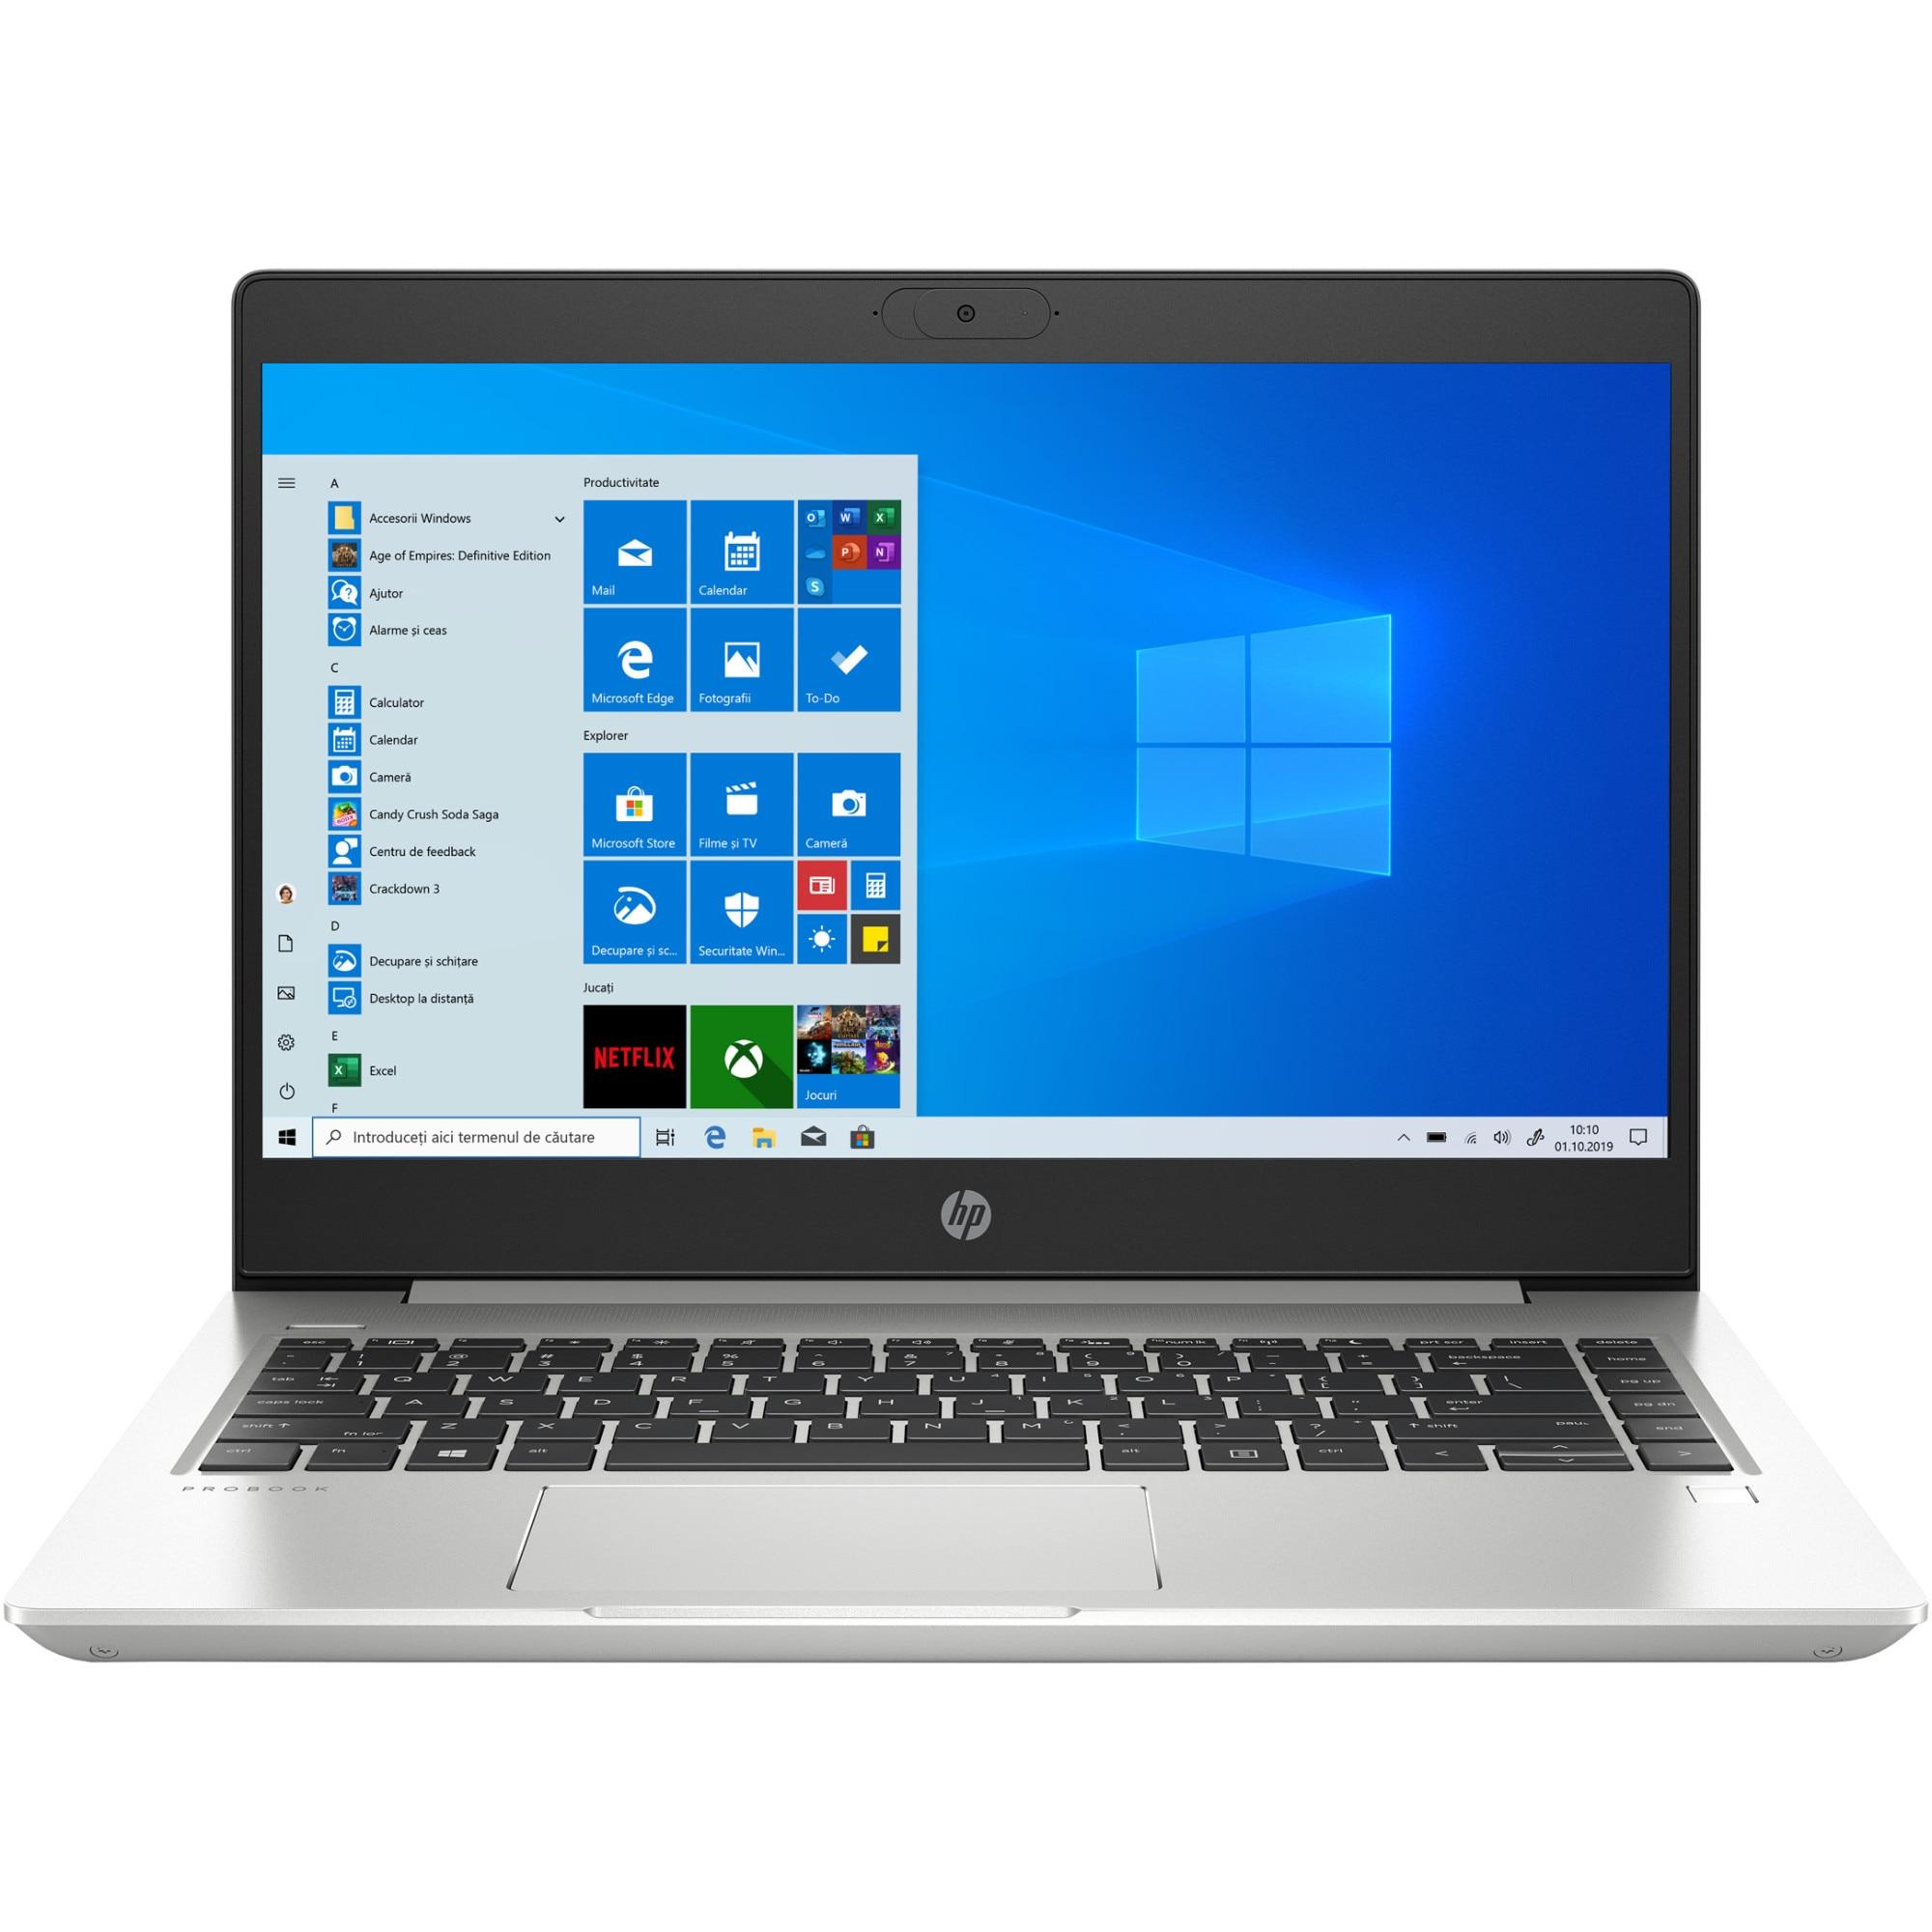 "Fotografie Laptop ultraportabil HP ProBook 445 G7 cu procesor AMD Ryzen 5 4500U, 14"", Full HD, 8GB, 512GB SSD, AMD Radeon Graphics, Windows 10 Pro, Silver"